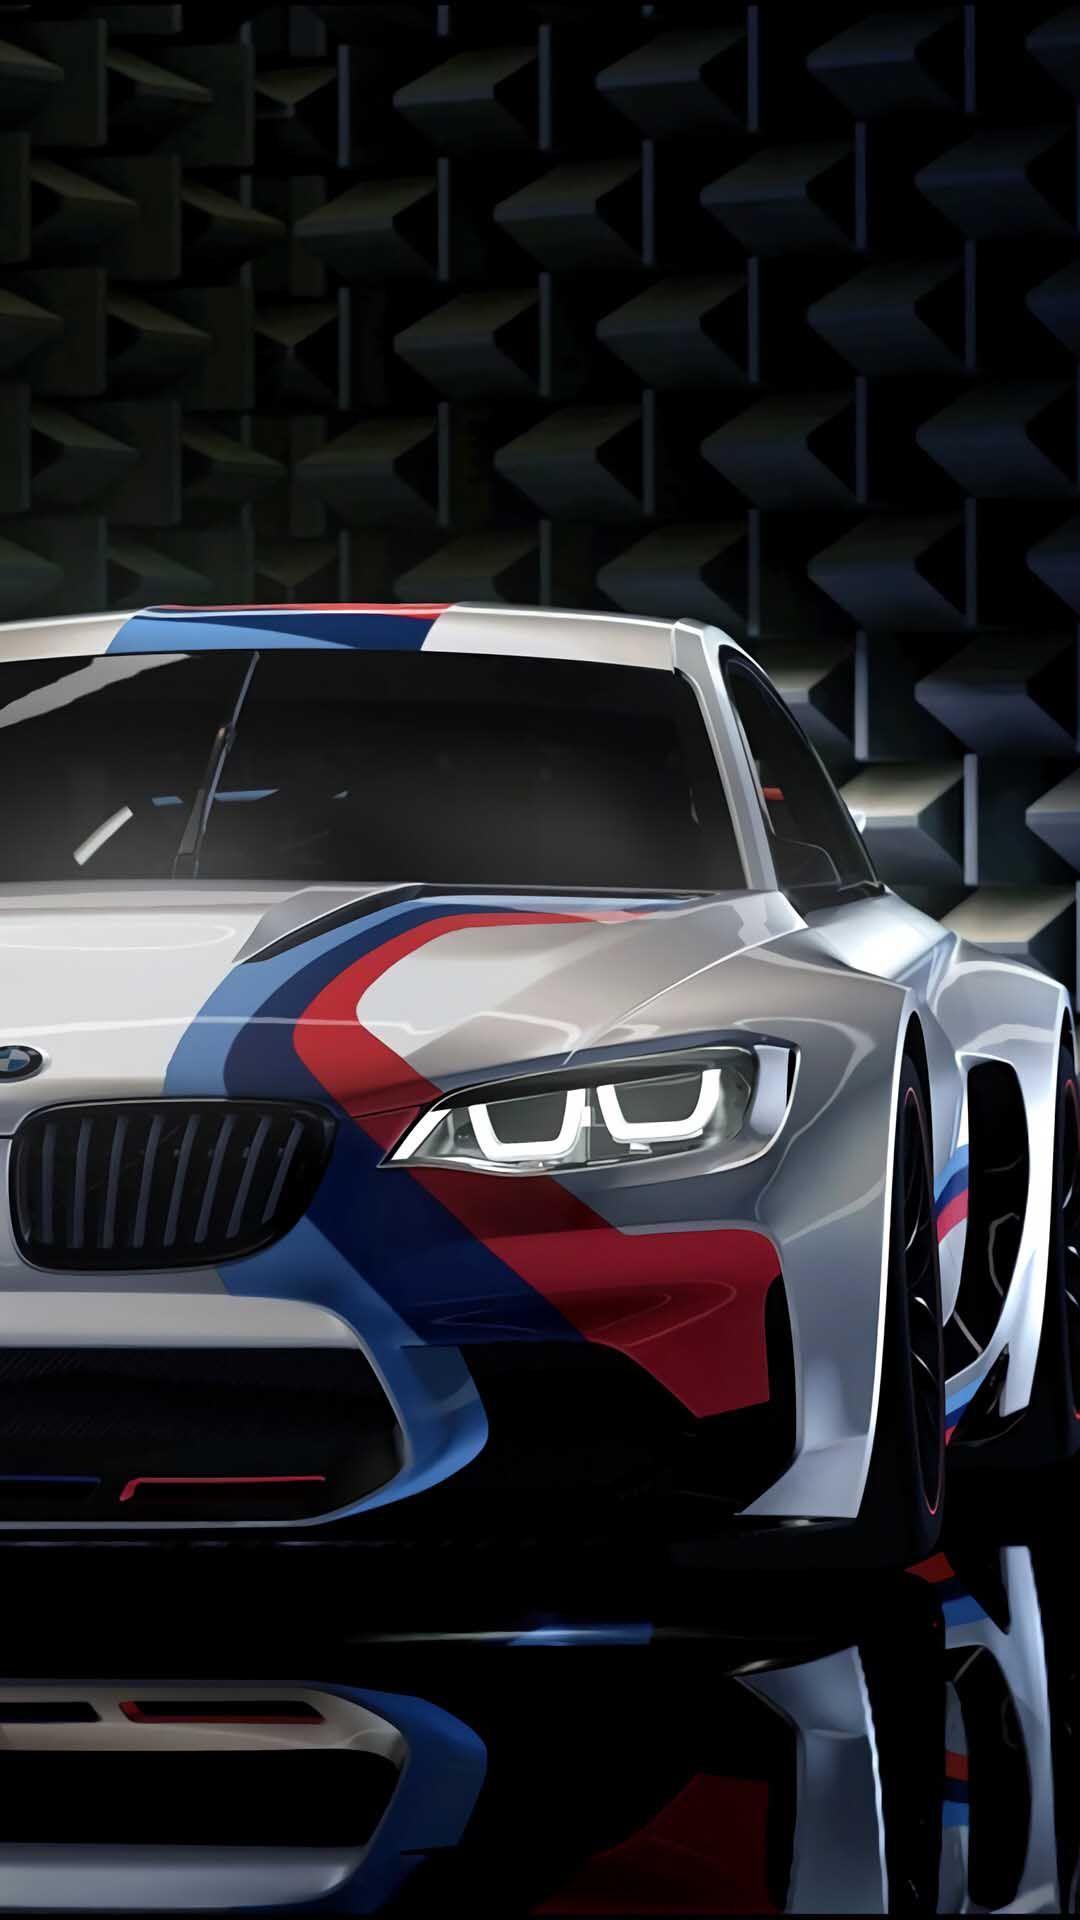 Bmwレーシングカー Iphone11 スマホ壁紙 待受画像ギャラリー Bmw車 車の壁紙 壁紙